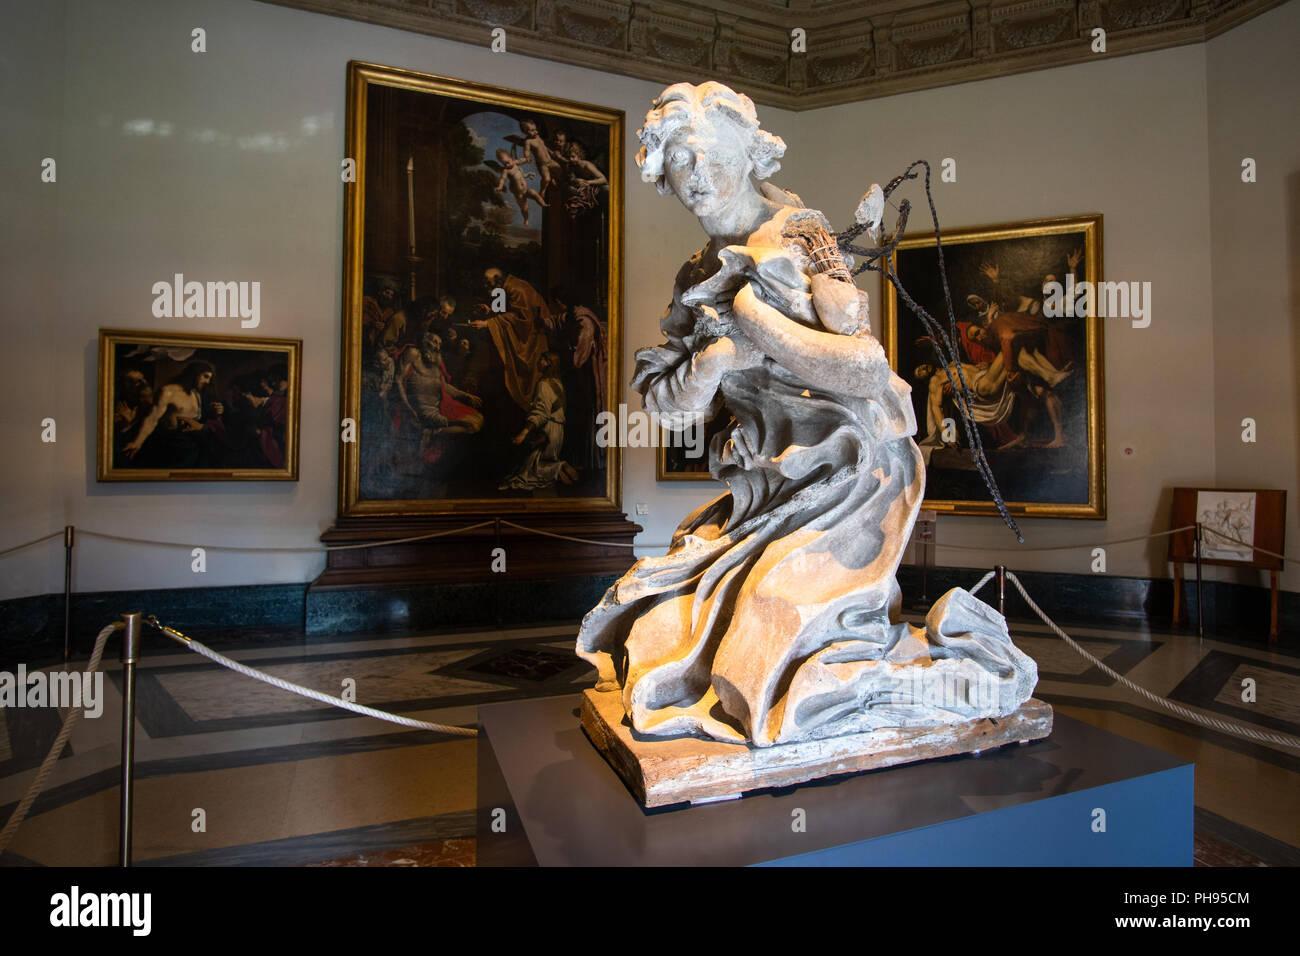 Vatican city, Rome - March 07, 2018: Bernini preparatory model of an angel in Pinacoteca gallery in Vatican museums - Stock Image